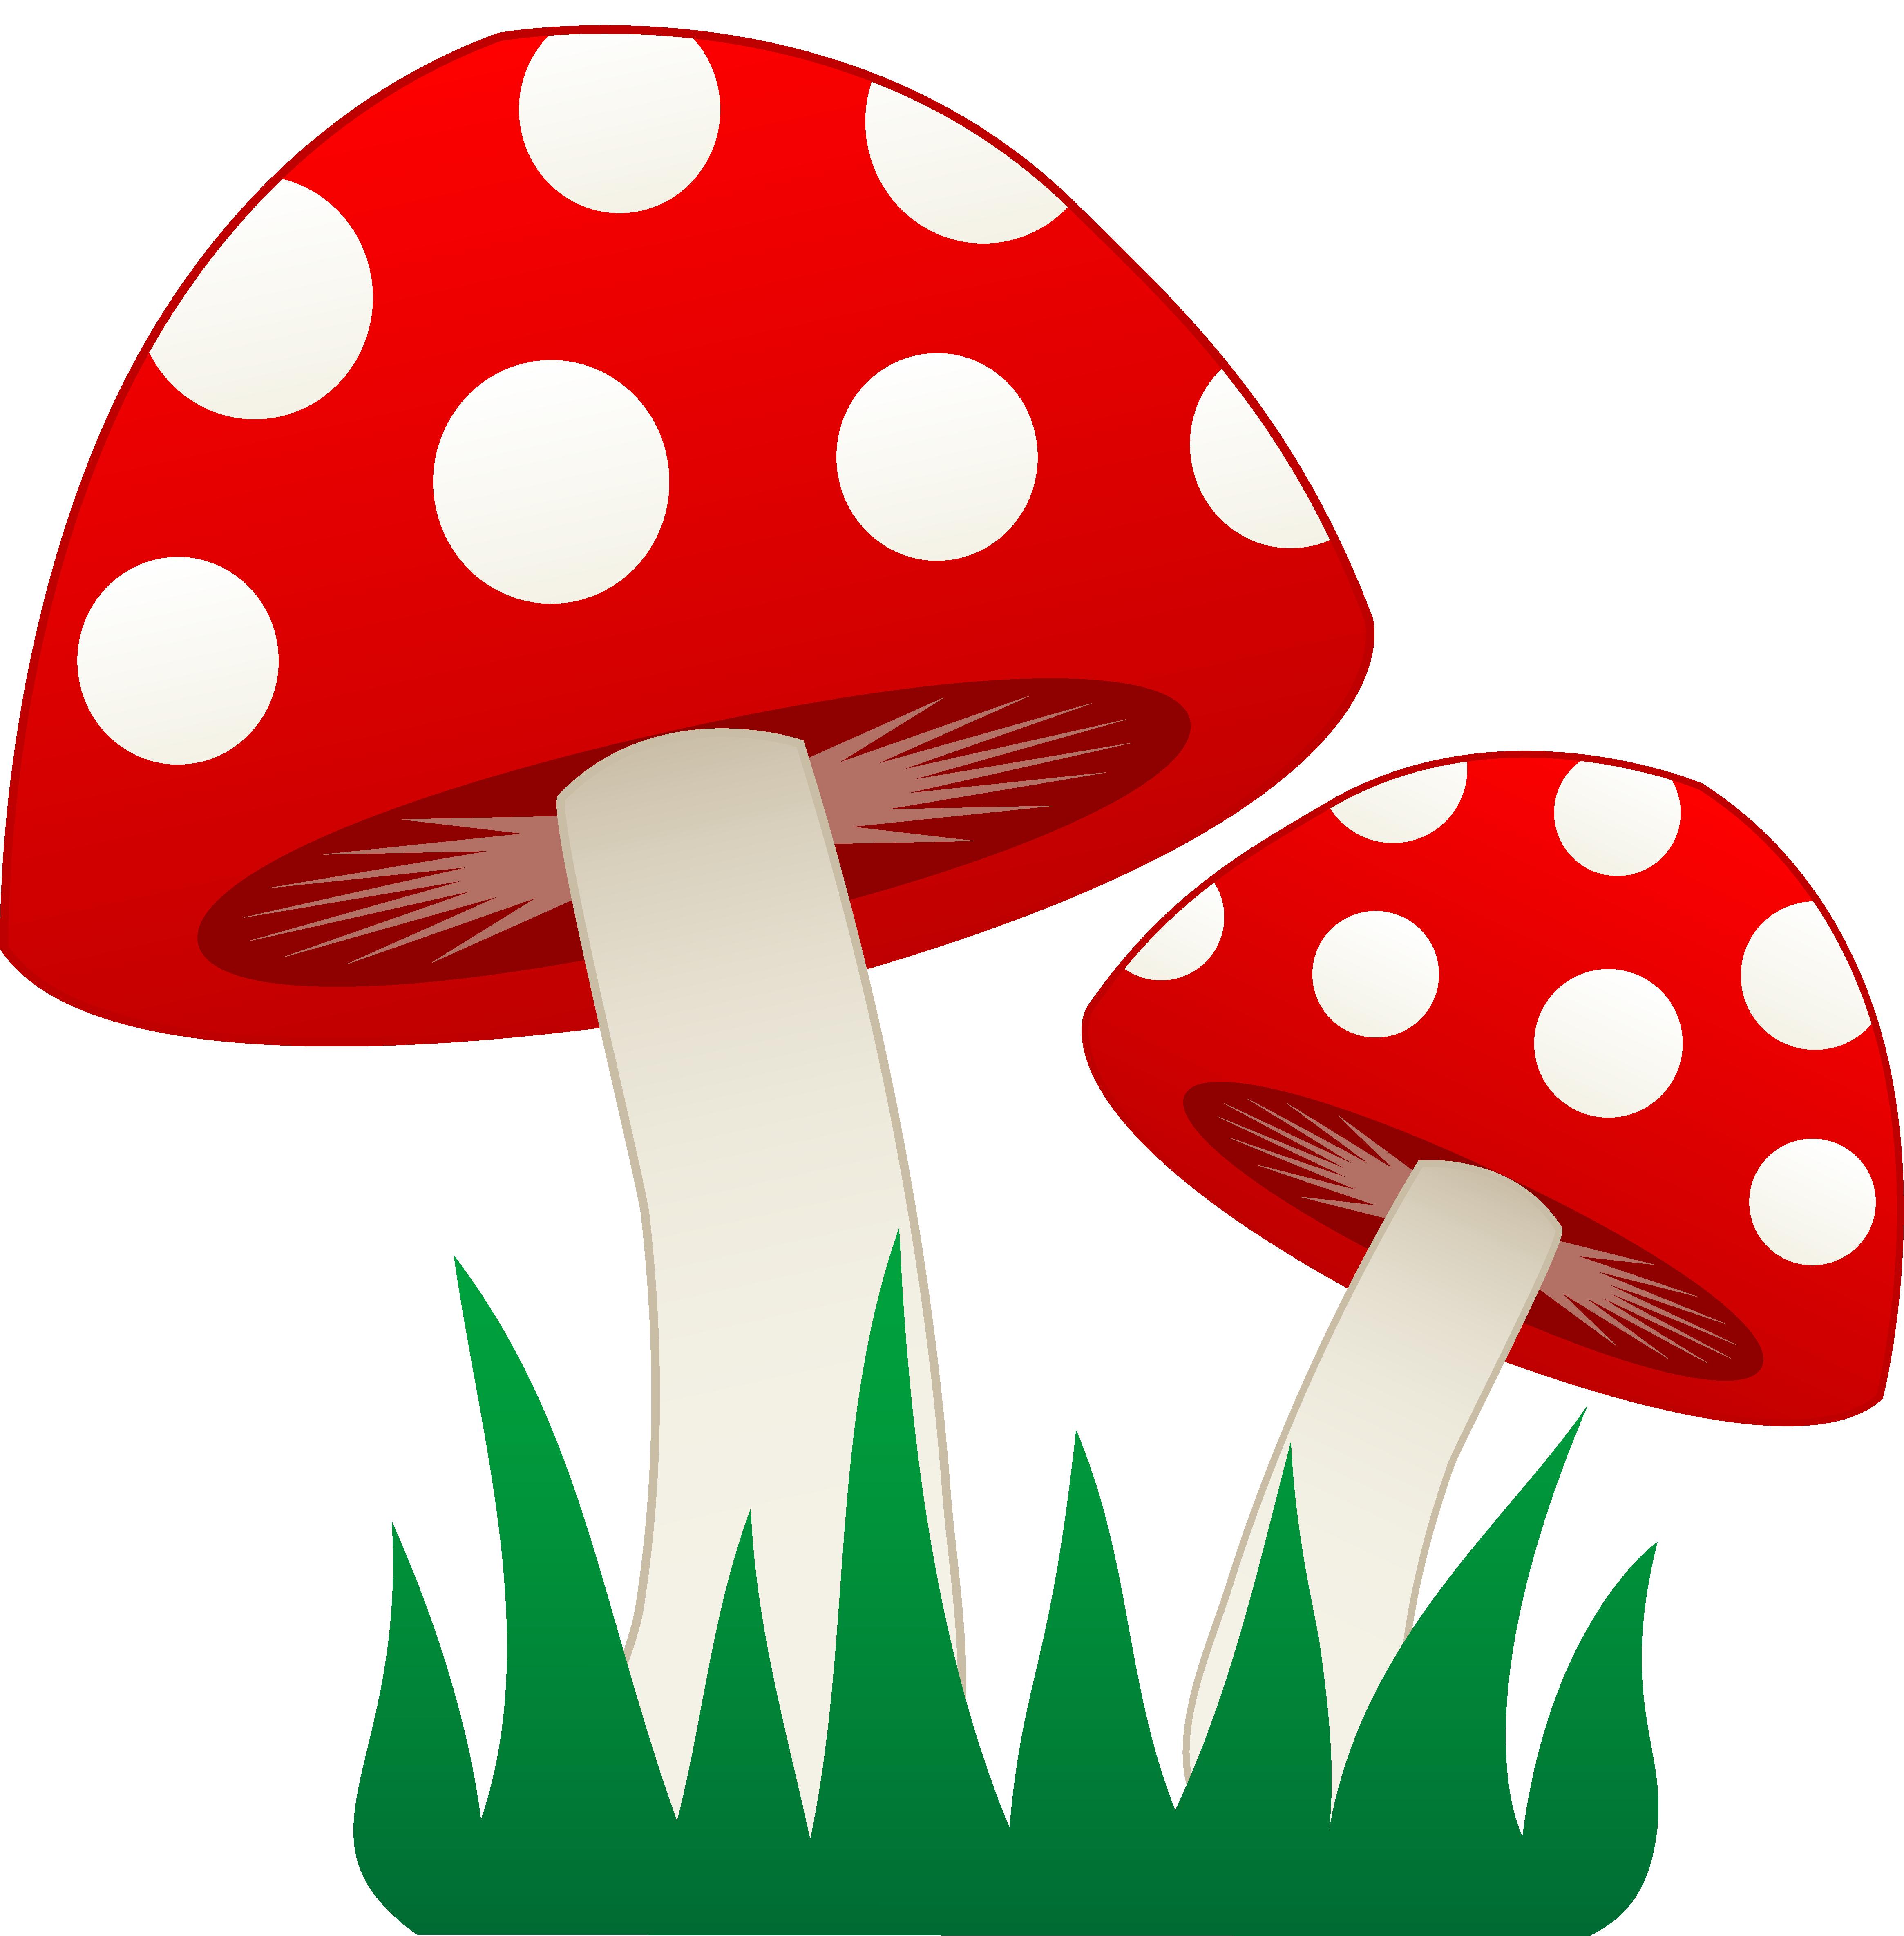 Magical clipart mushroom #4 - Toadstool PNG HD